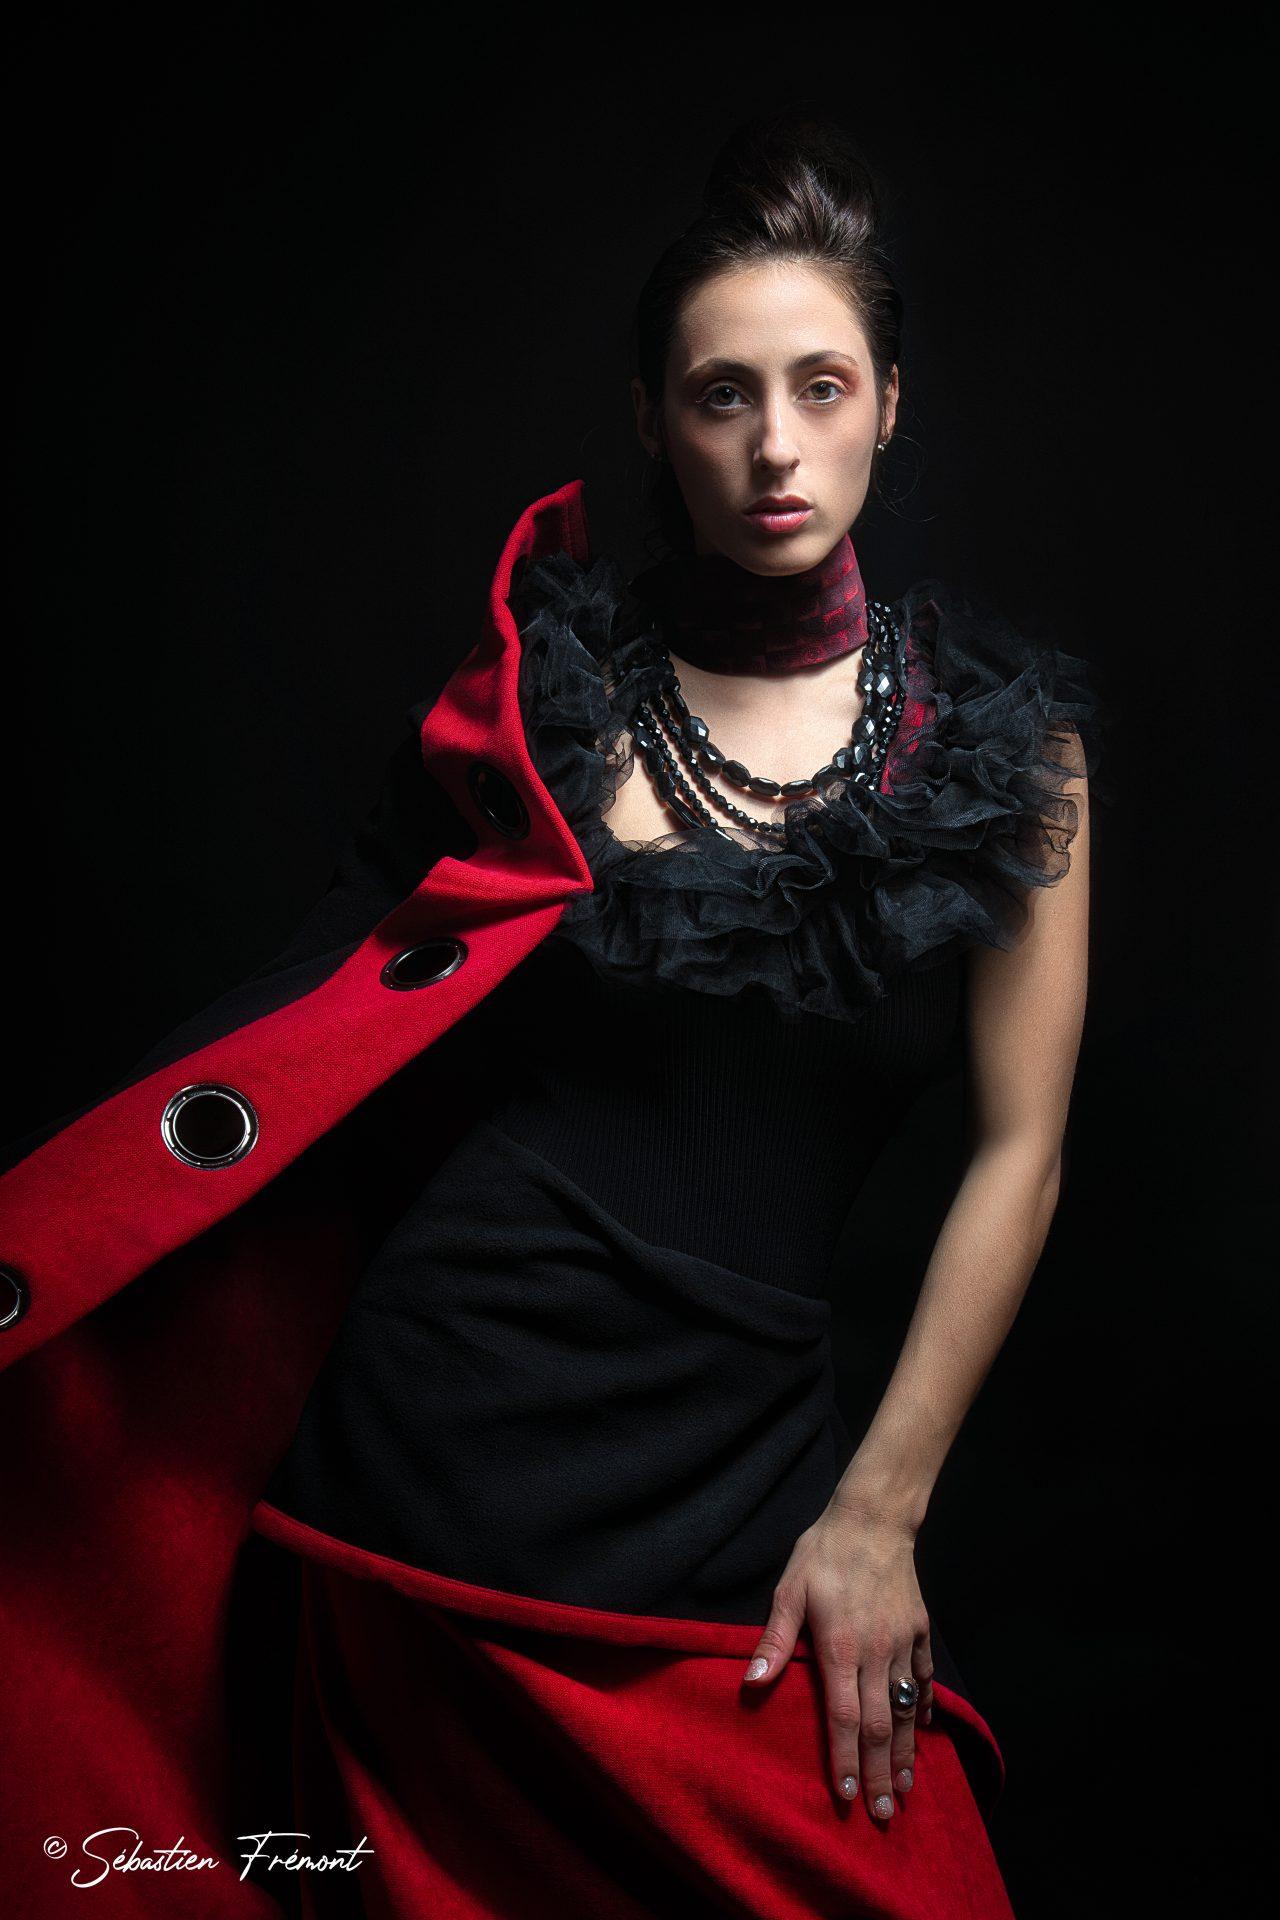 French Photographer Fashion Photography Omolusã / Mélanie Patzo